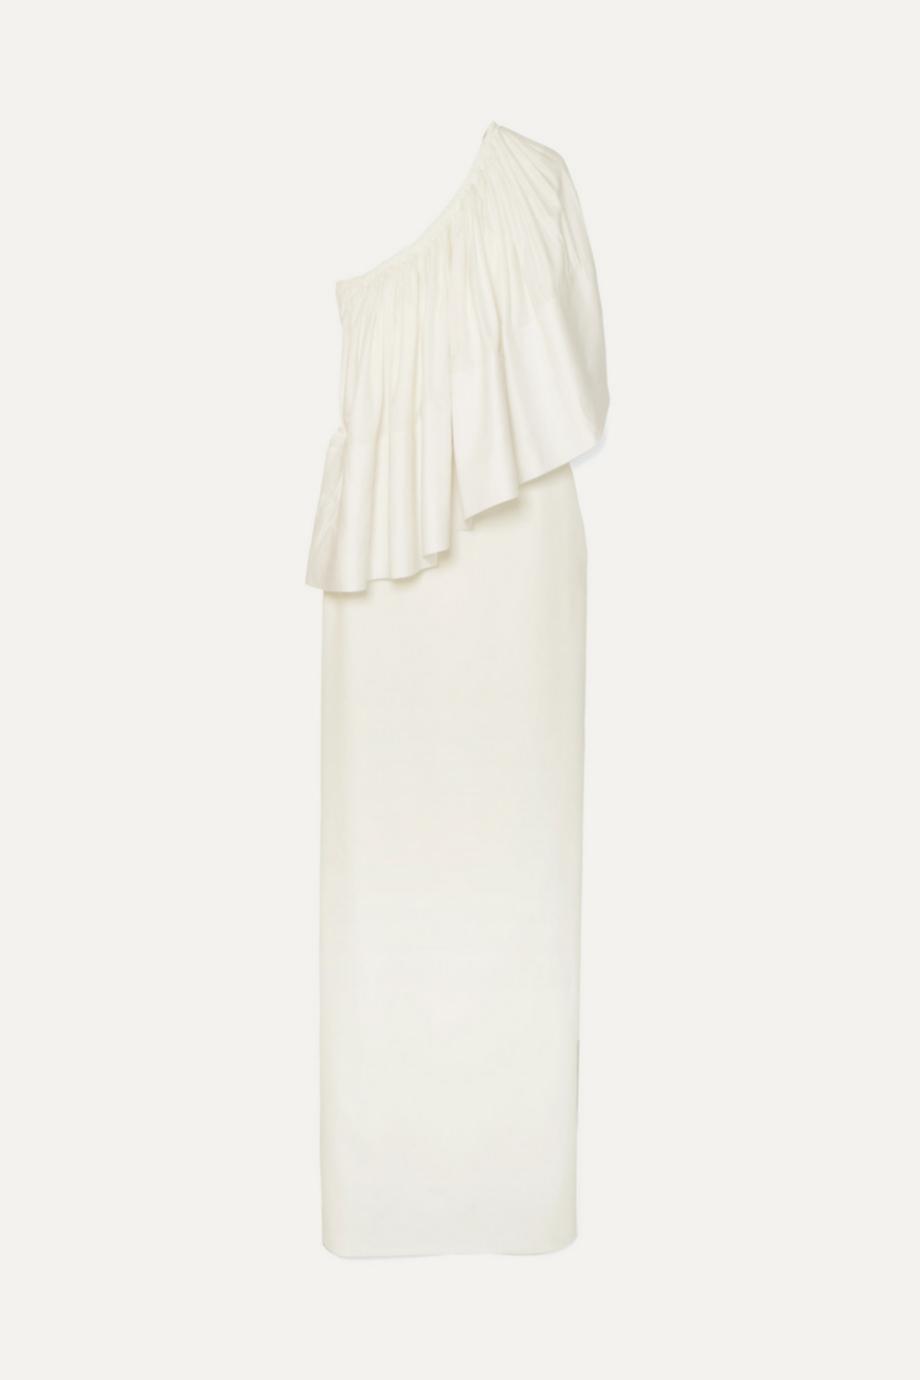 Vestido con escote asimétrico con volante de Solace London (305,33¤)